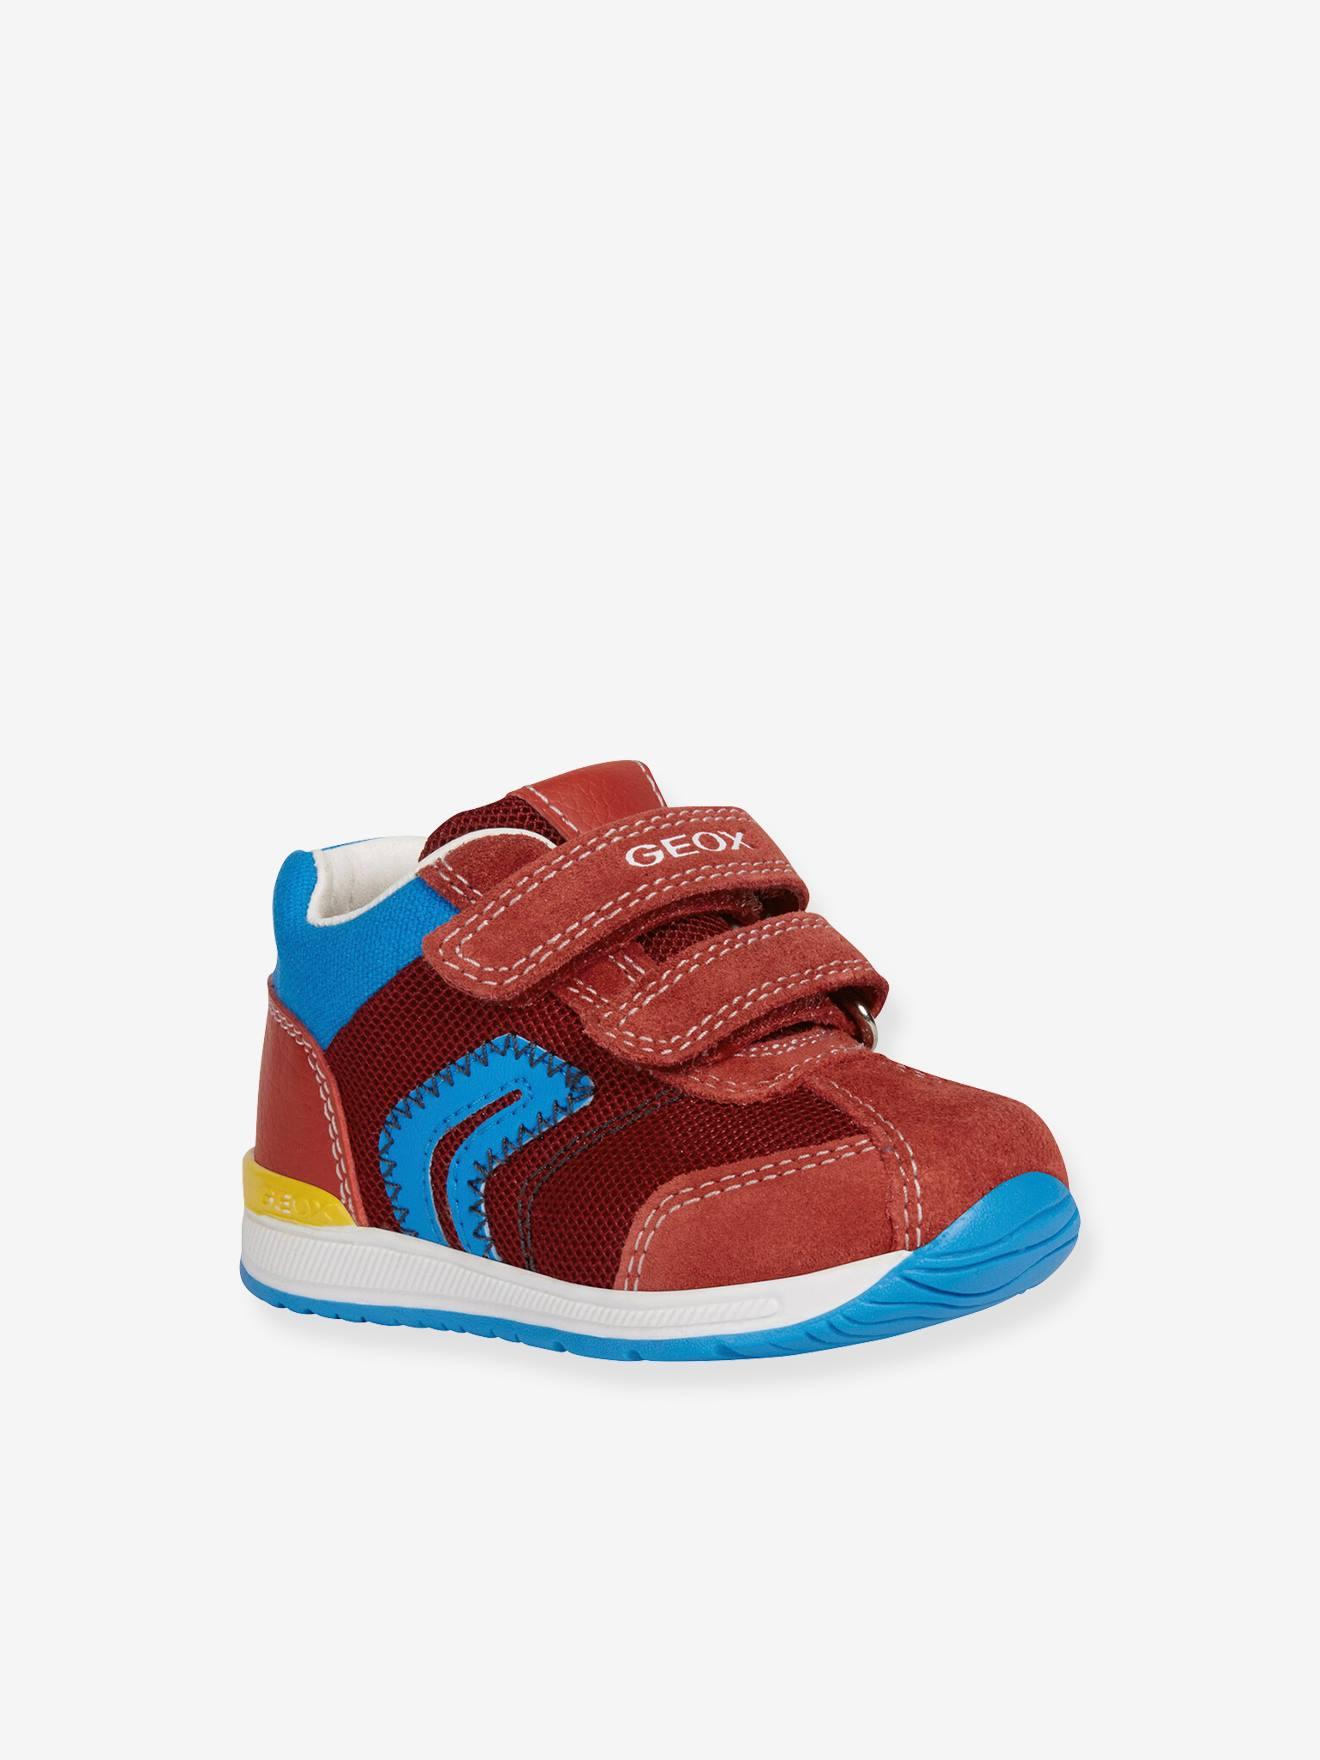 Baskets Mid bébé garçon Rishon GEOX® rouge